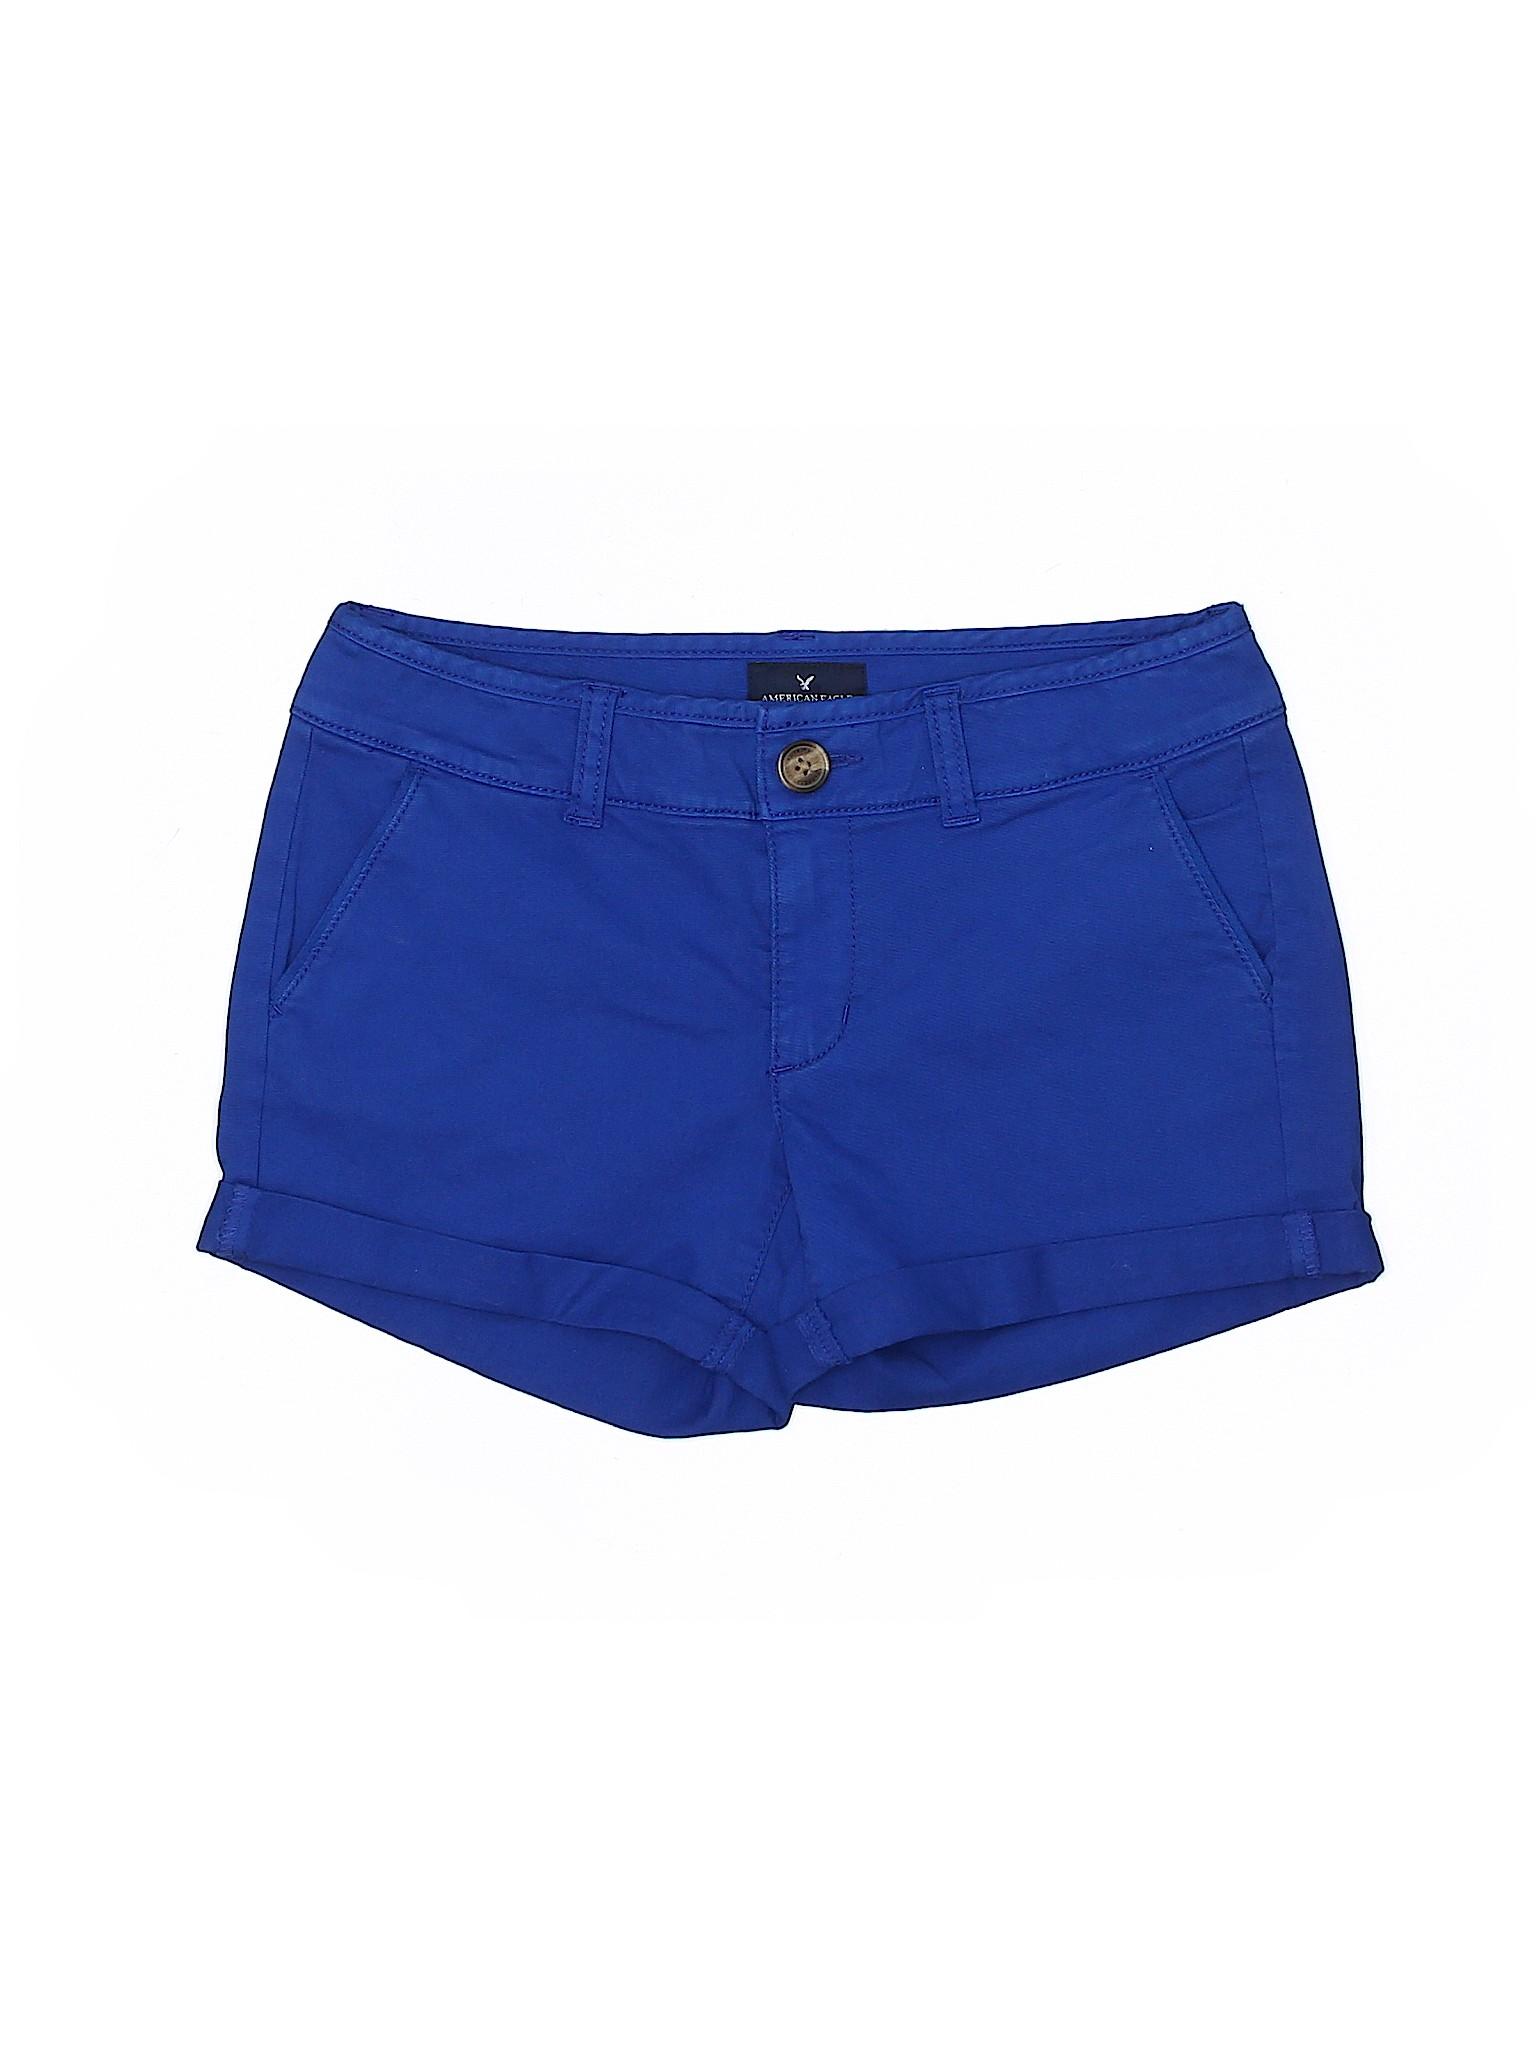 leisure Shorts Eagle Khaki American Outfitters Boutique dSxXzwd